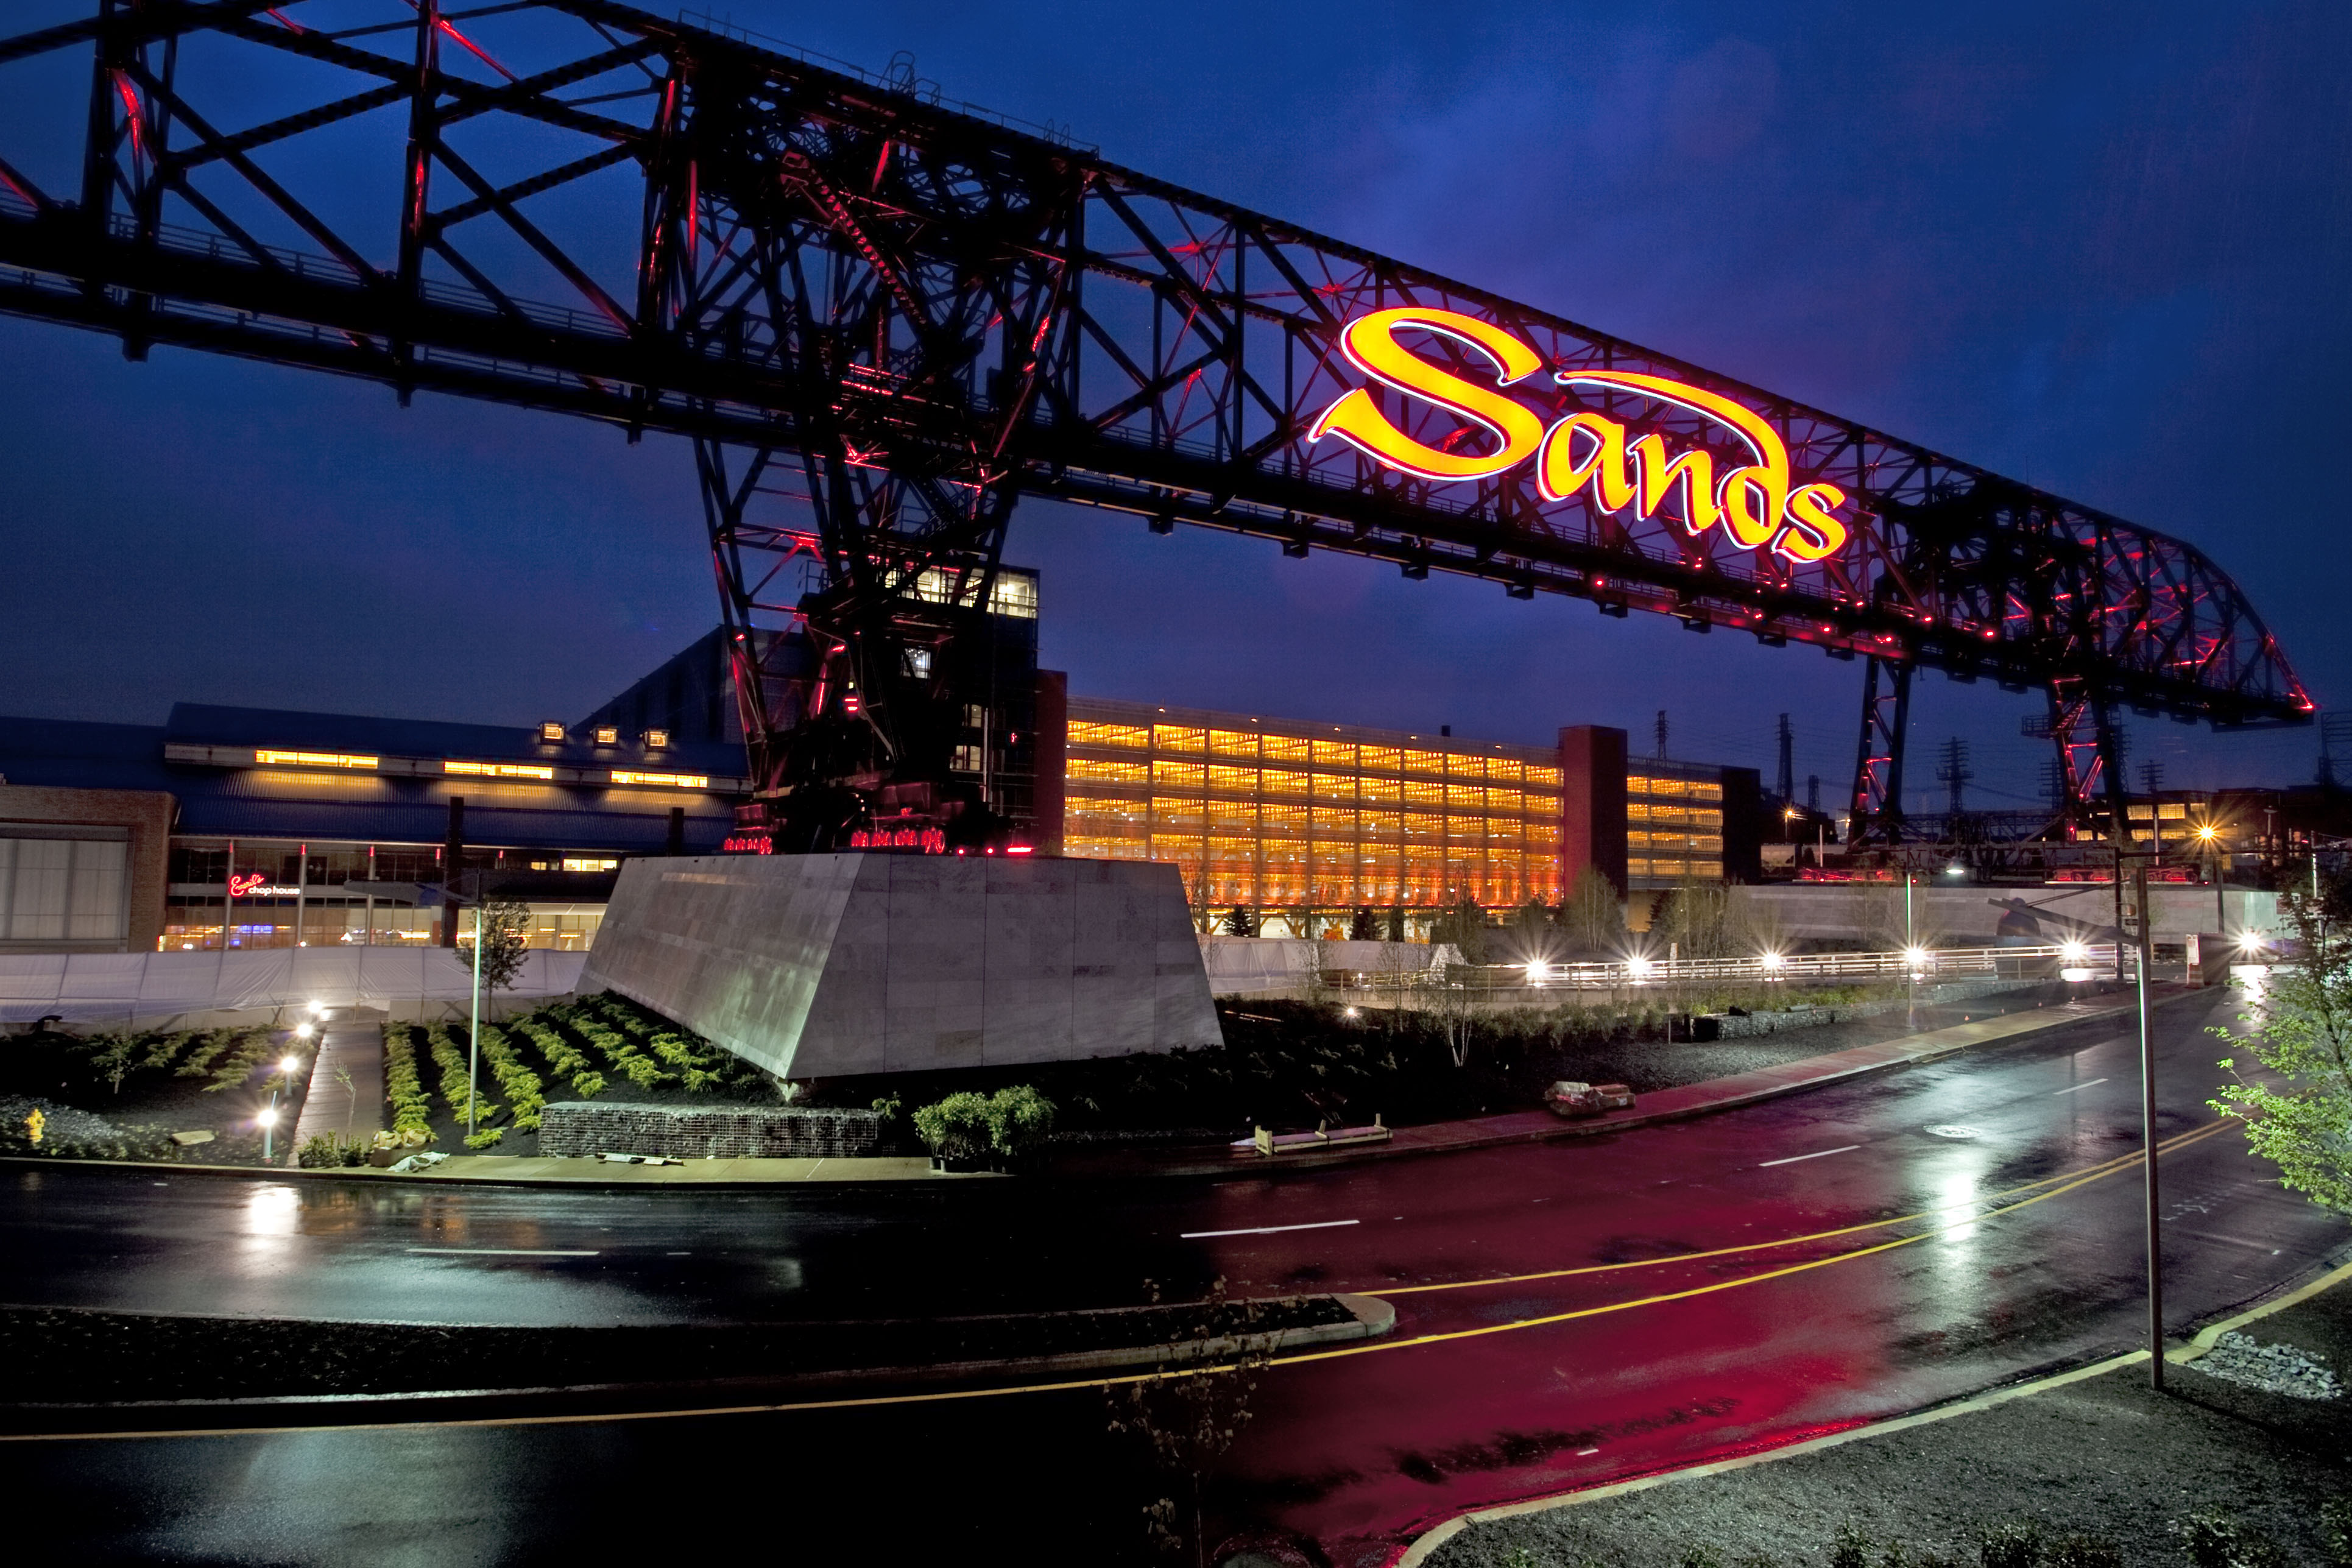 Sands casino pa craps at a casino